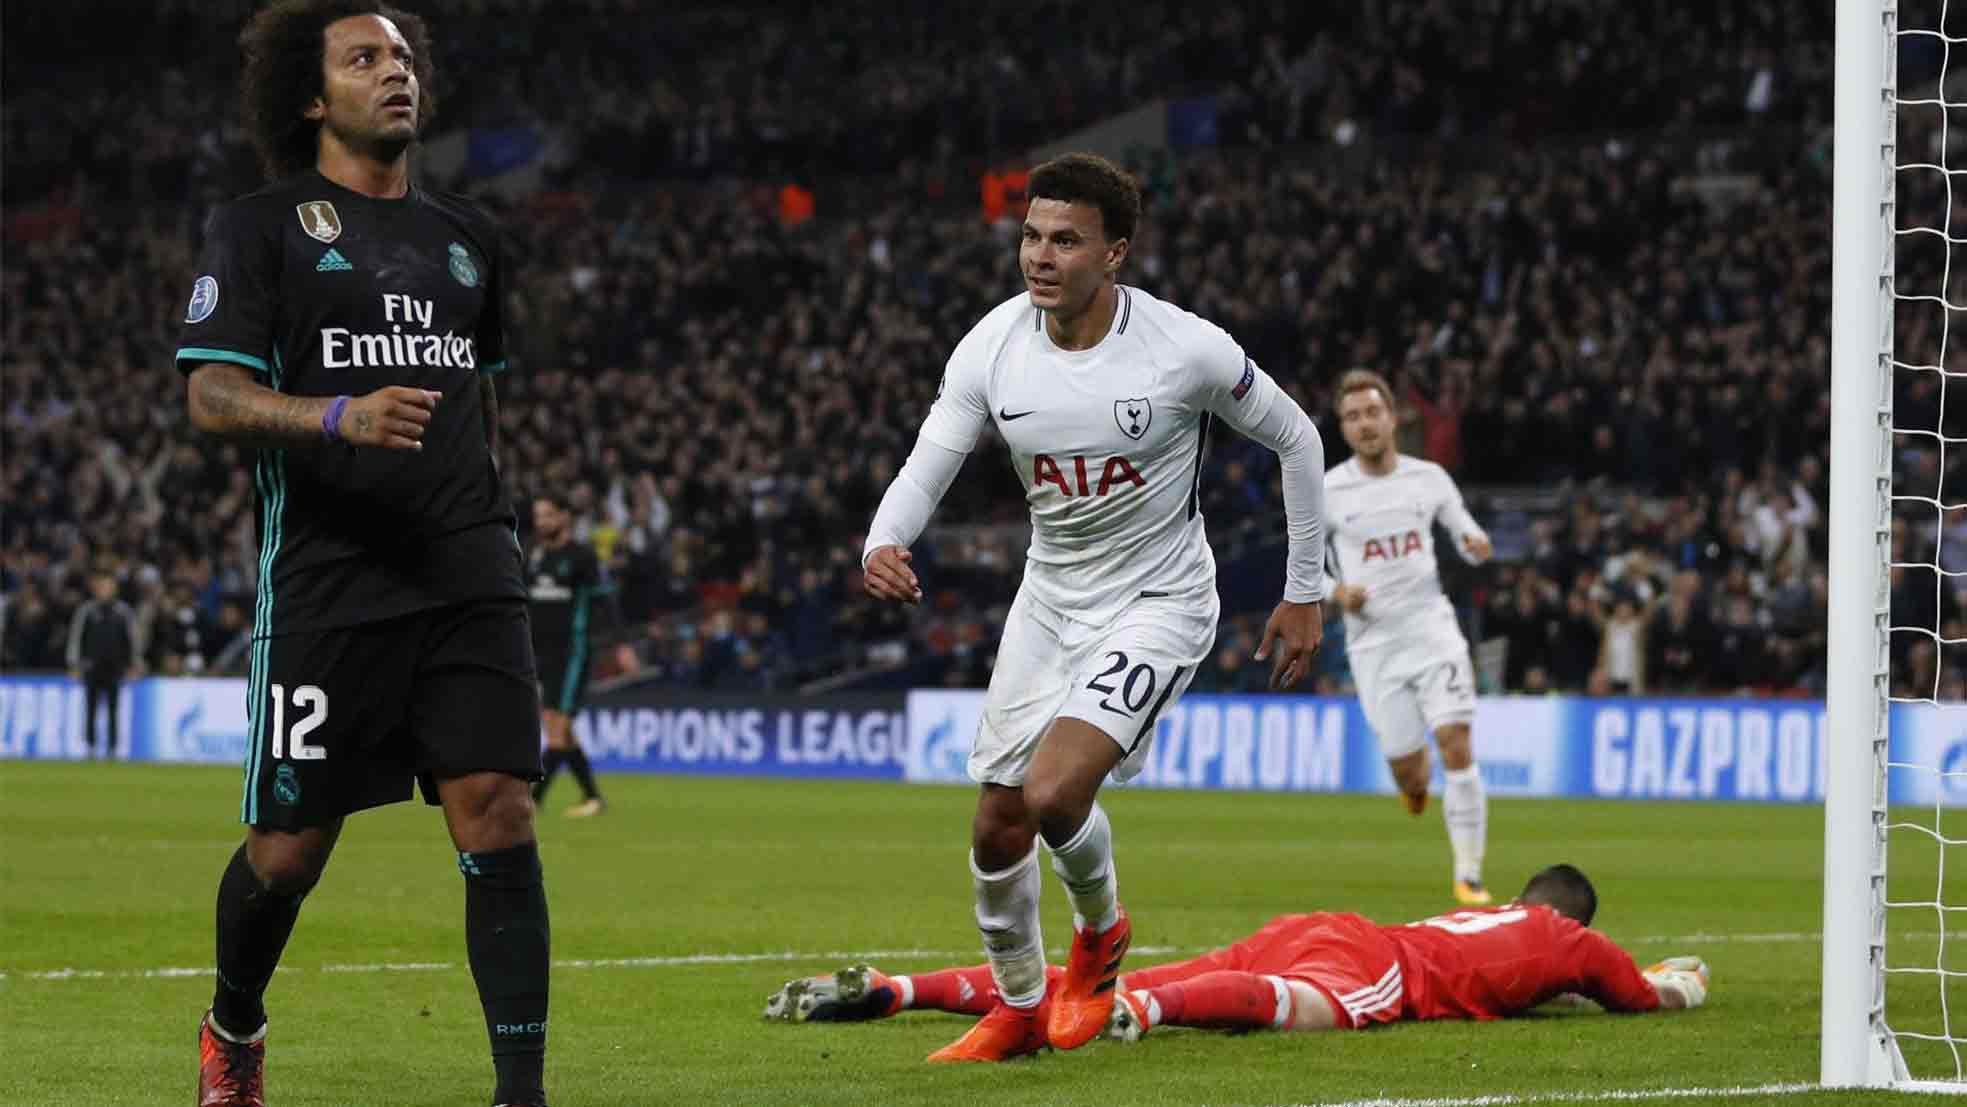 LACHAMPIONS | Tottenham - Real Madrid (3-1)